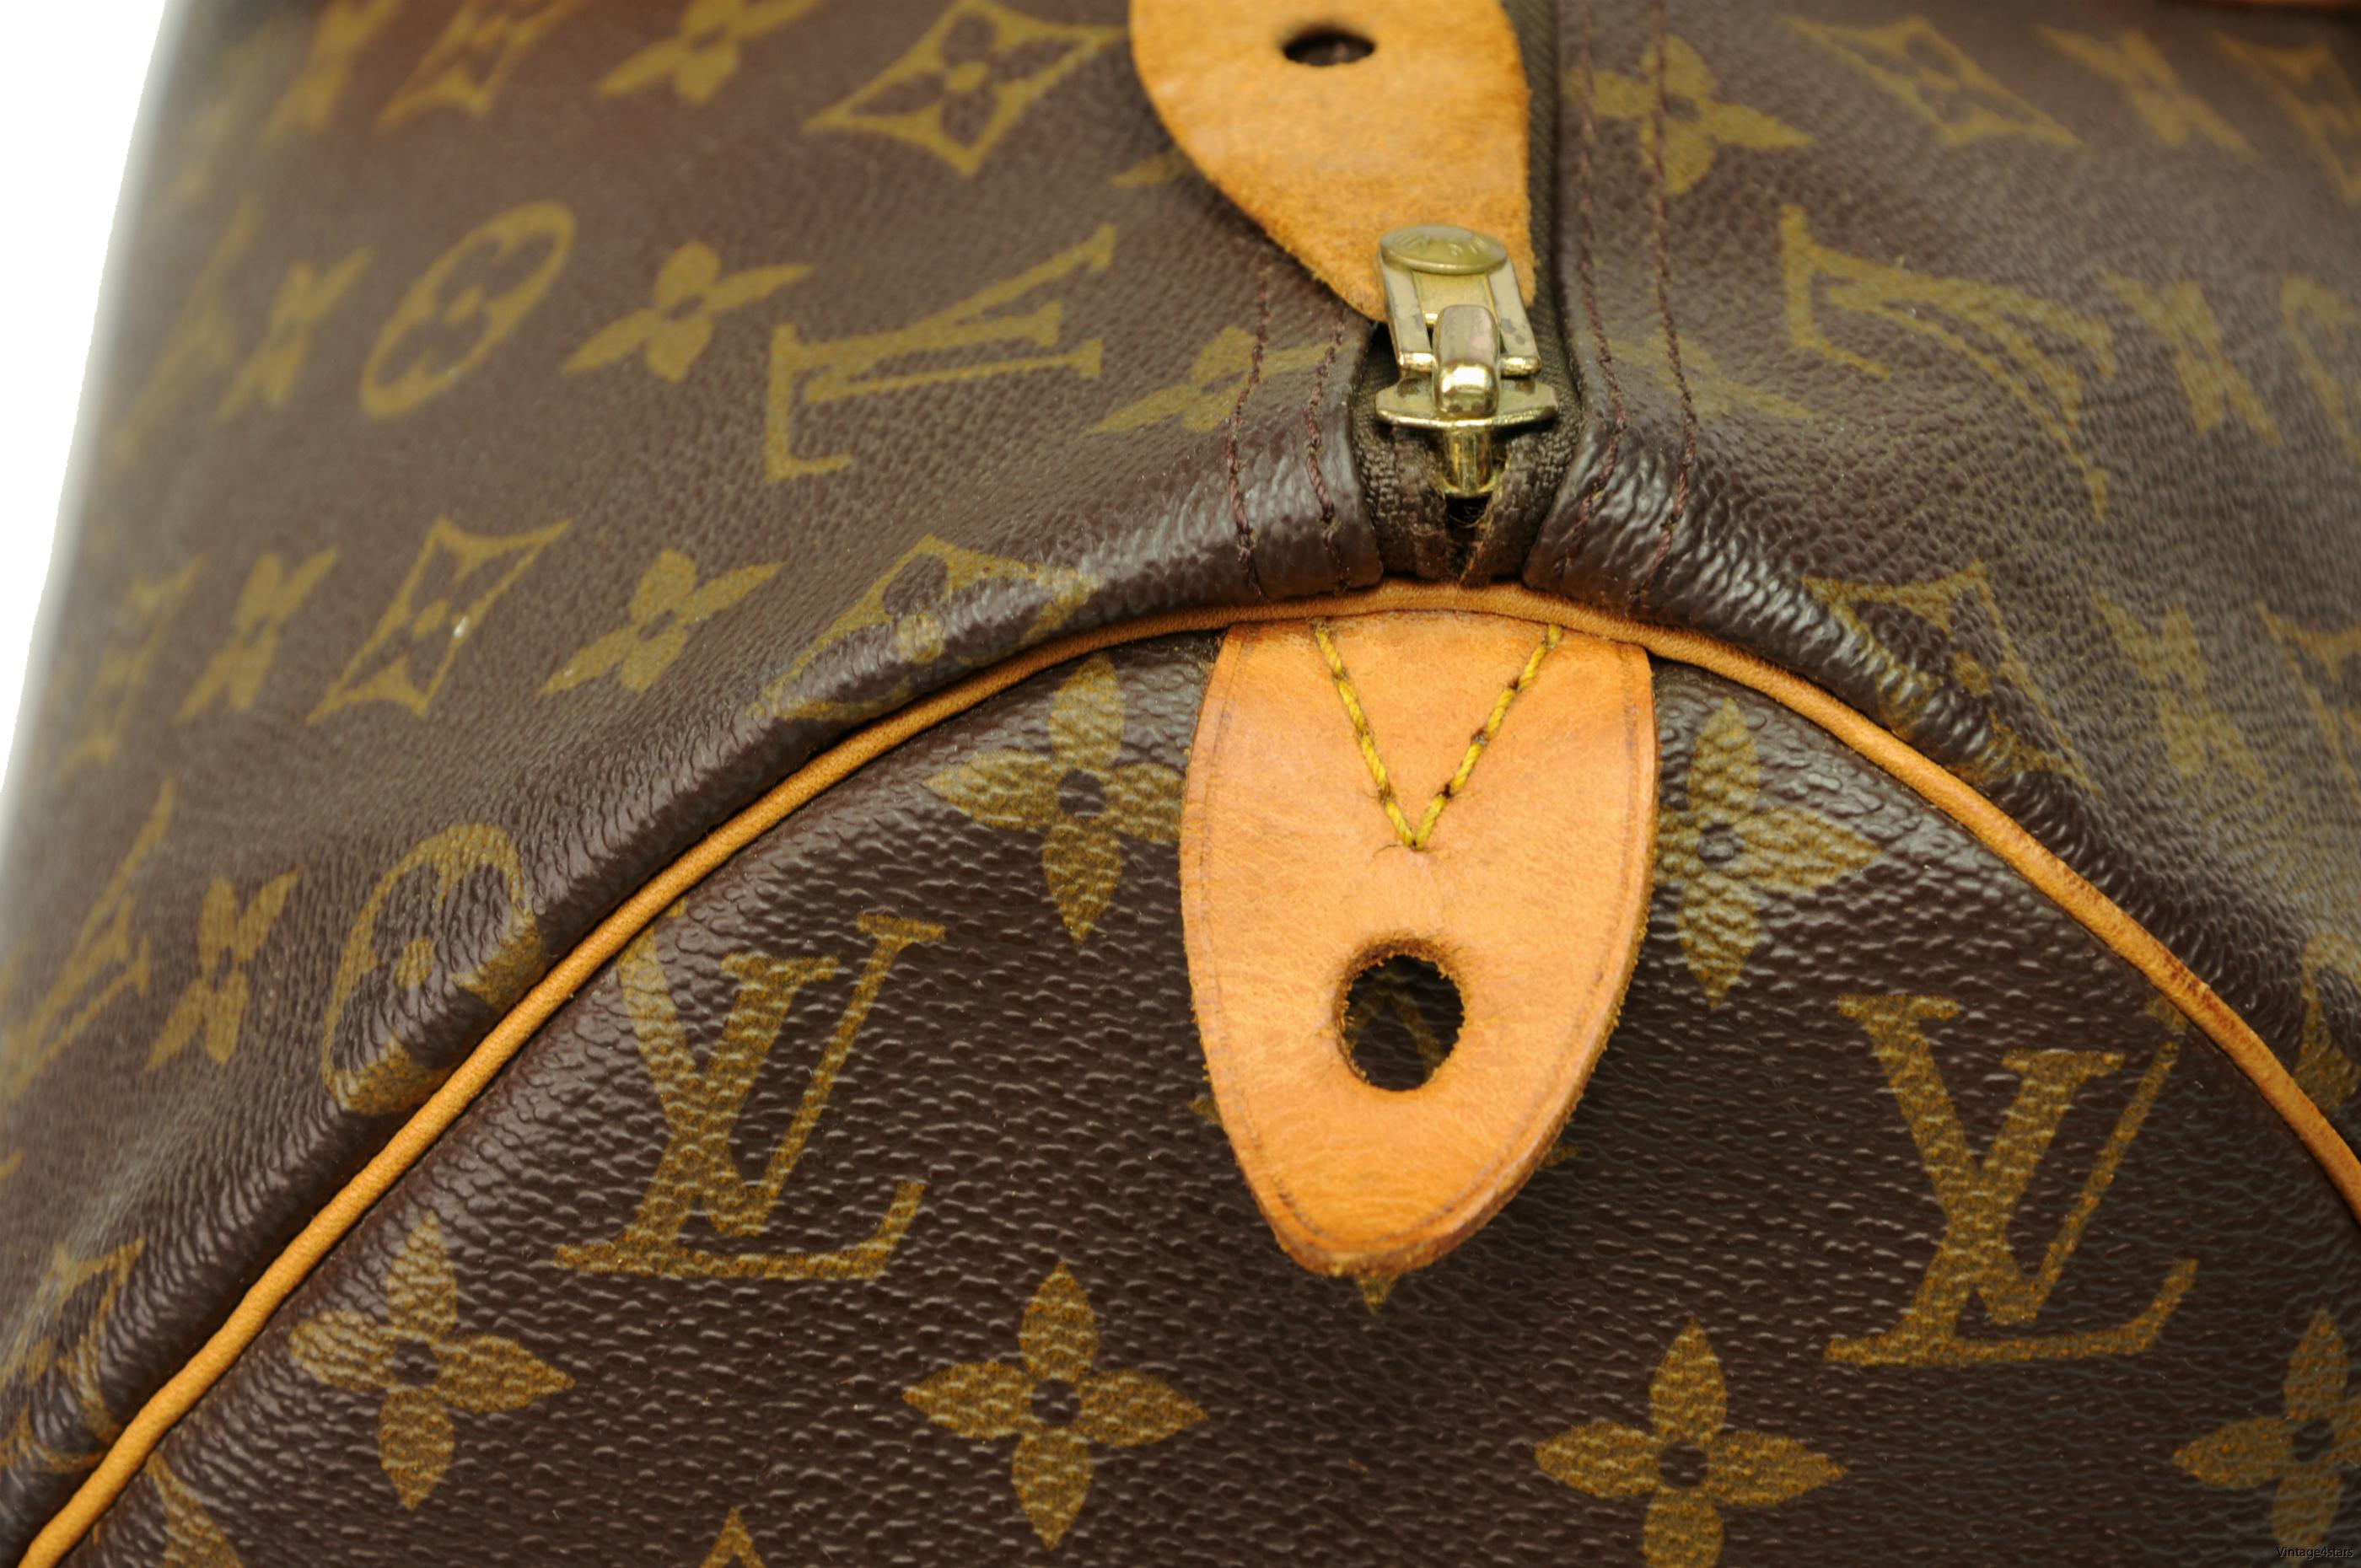 Louis Vuitton Speedy 40 Monogram 10